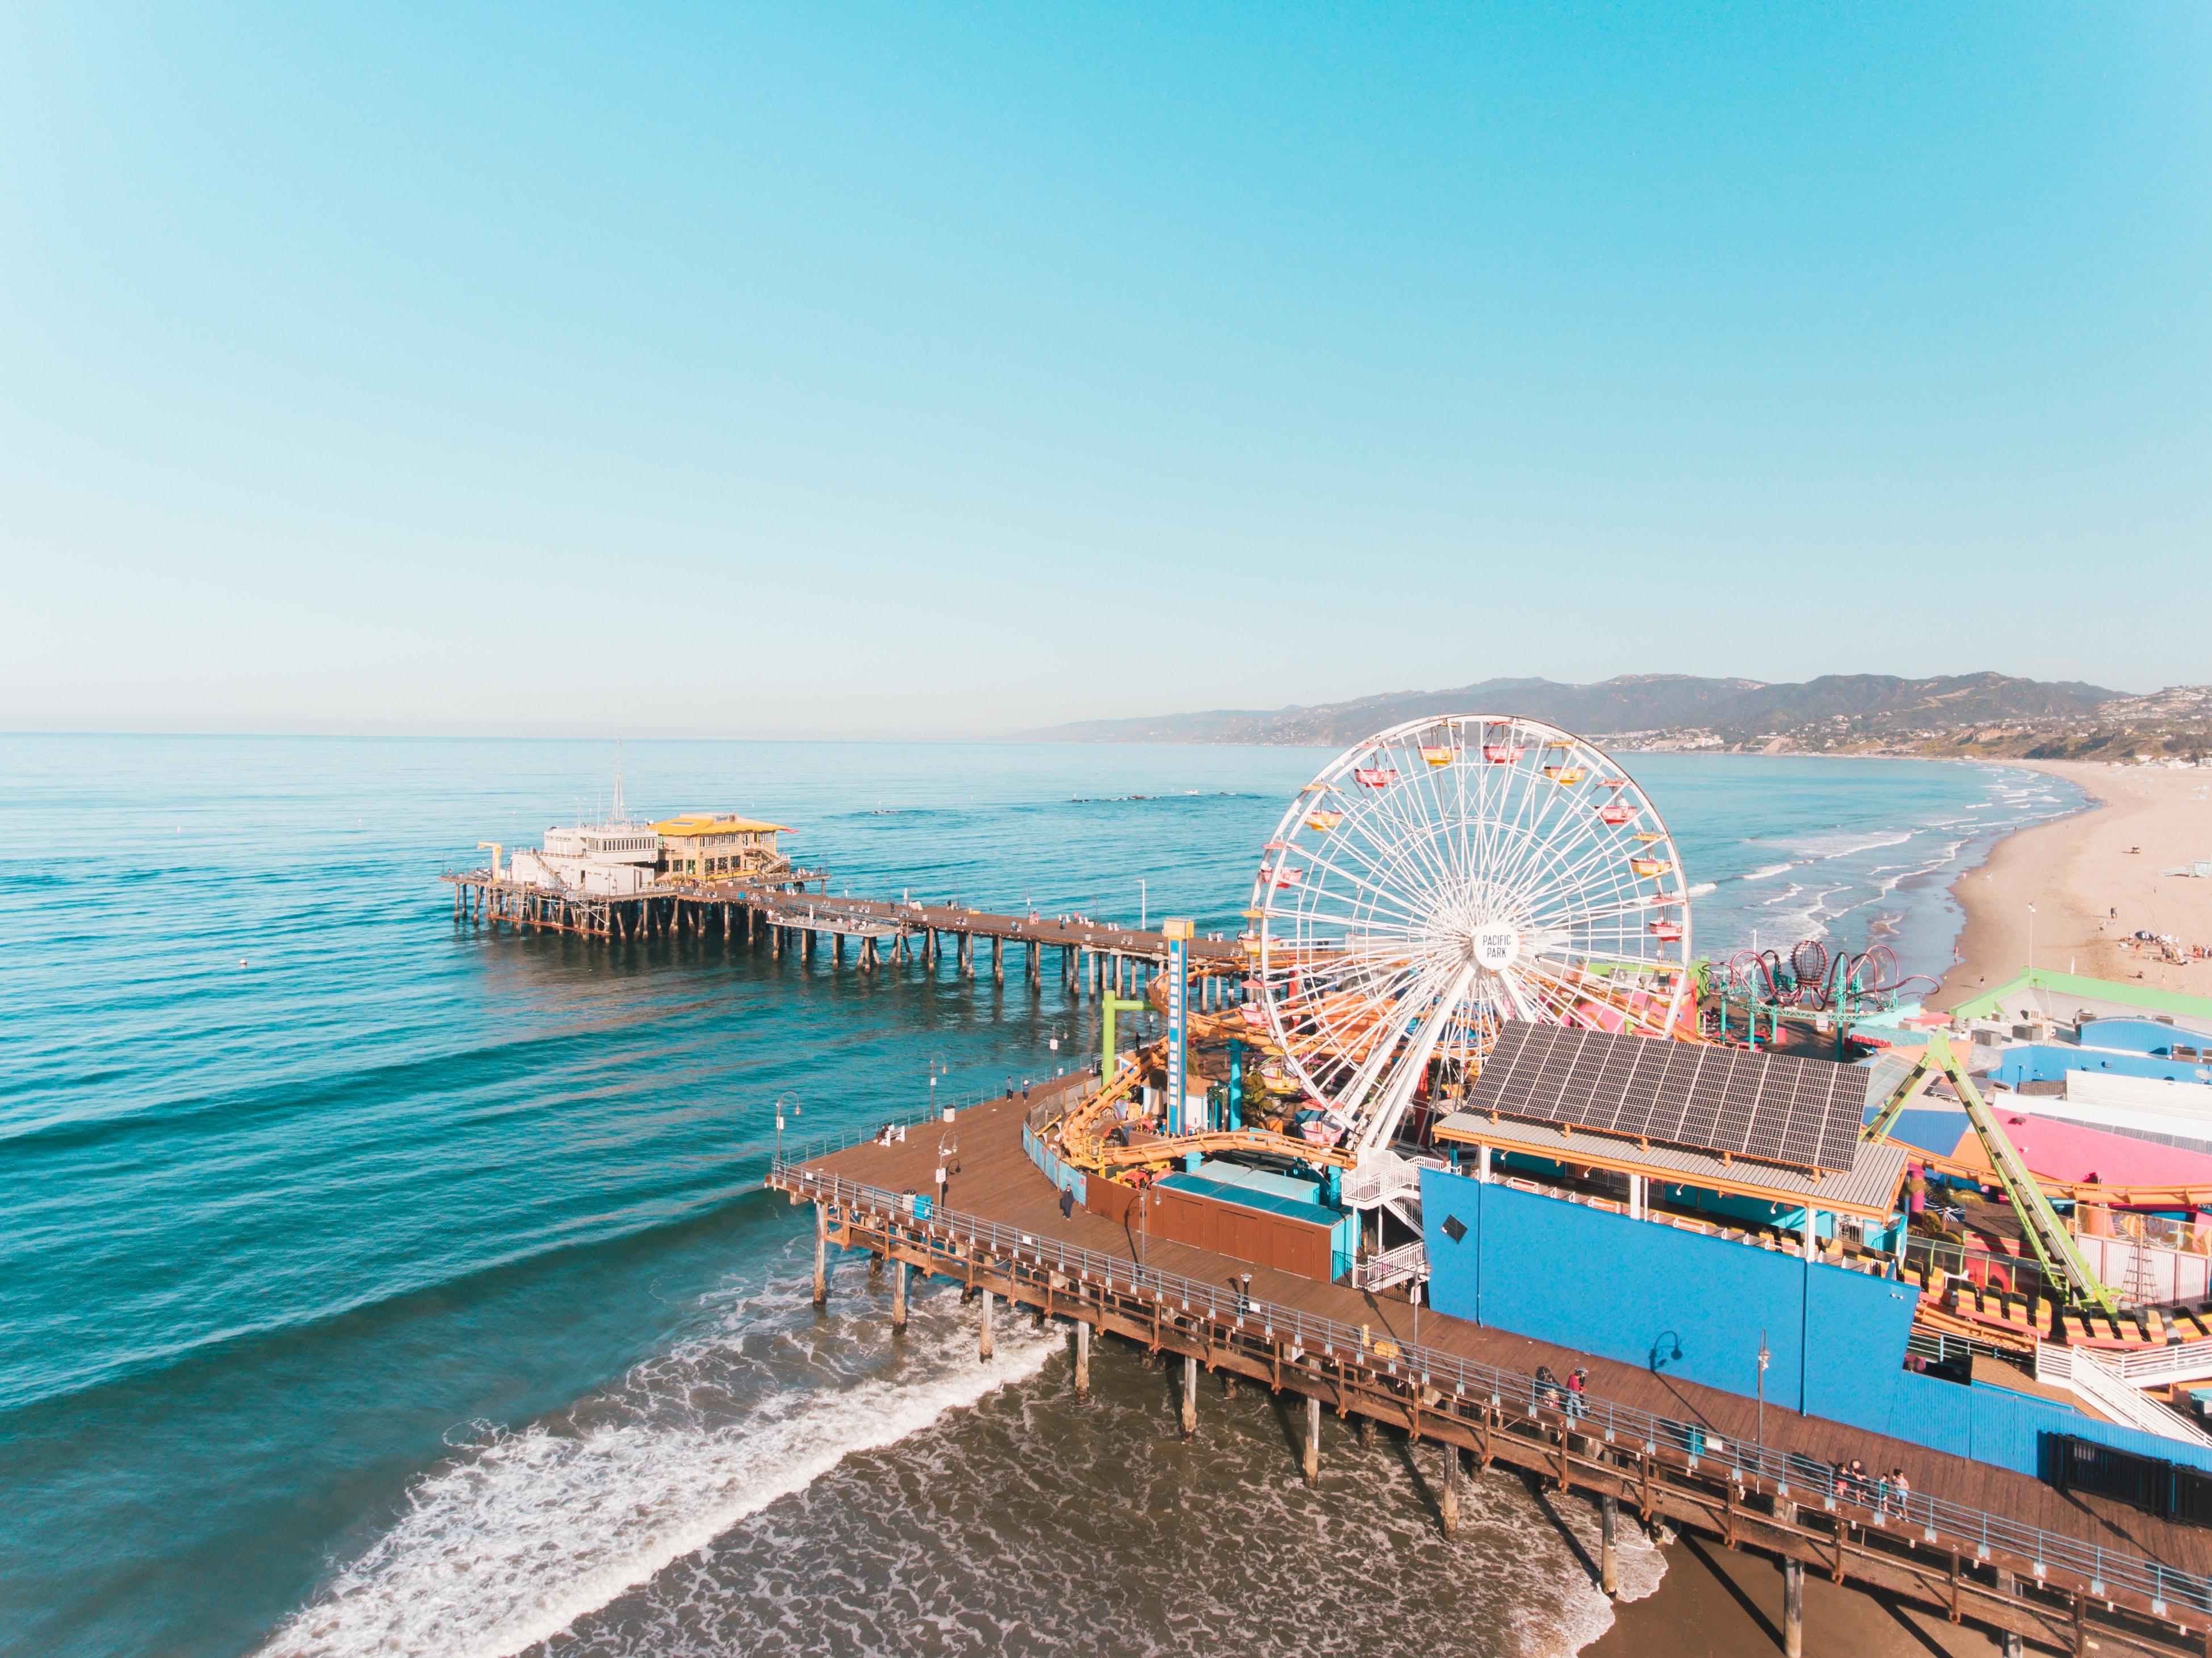 19. Santa Monica, California matthew-lejune-50hokKYxznc-unsplash